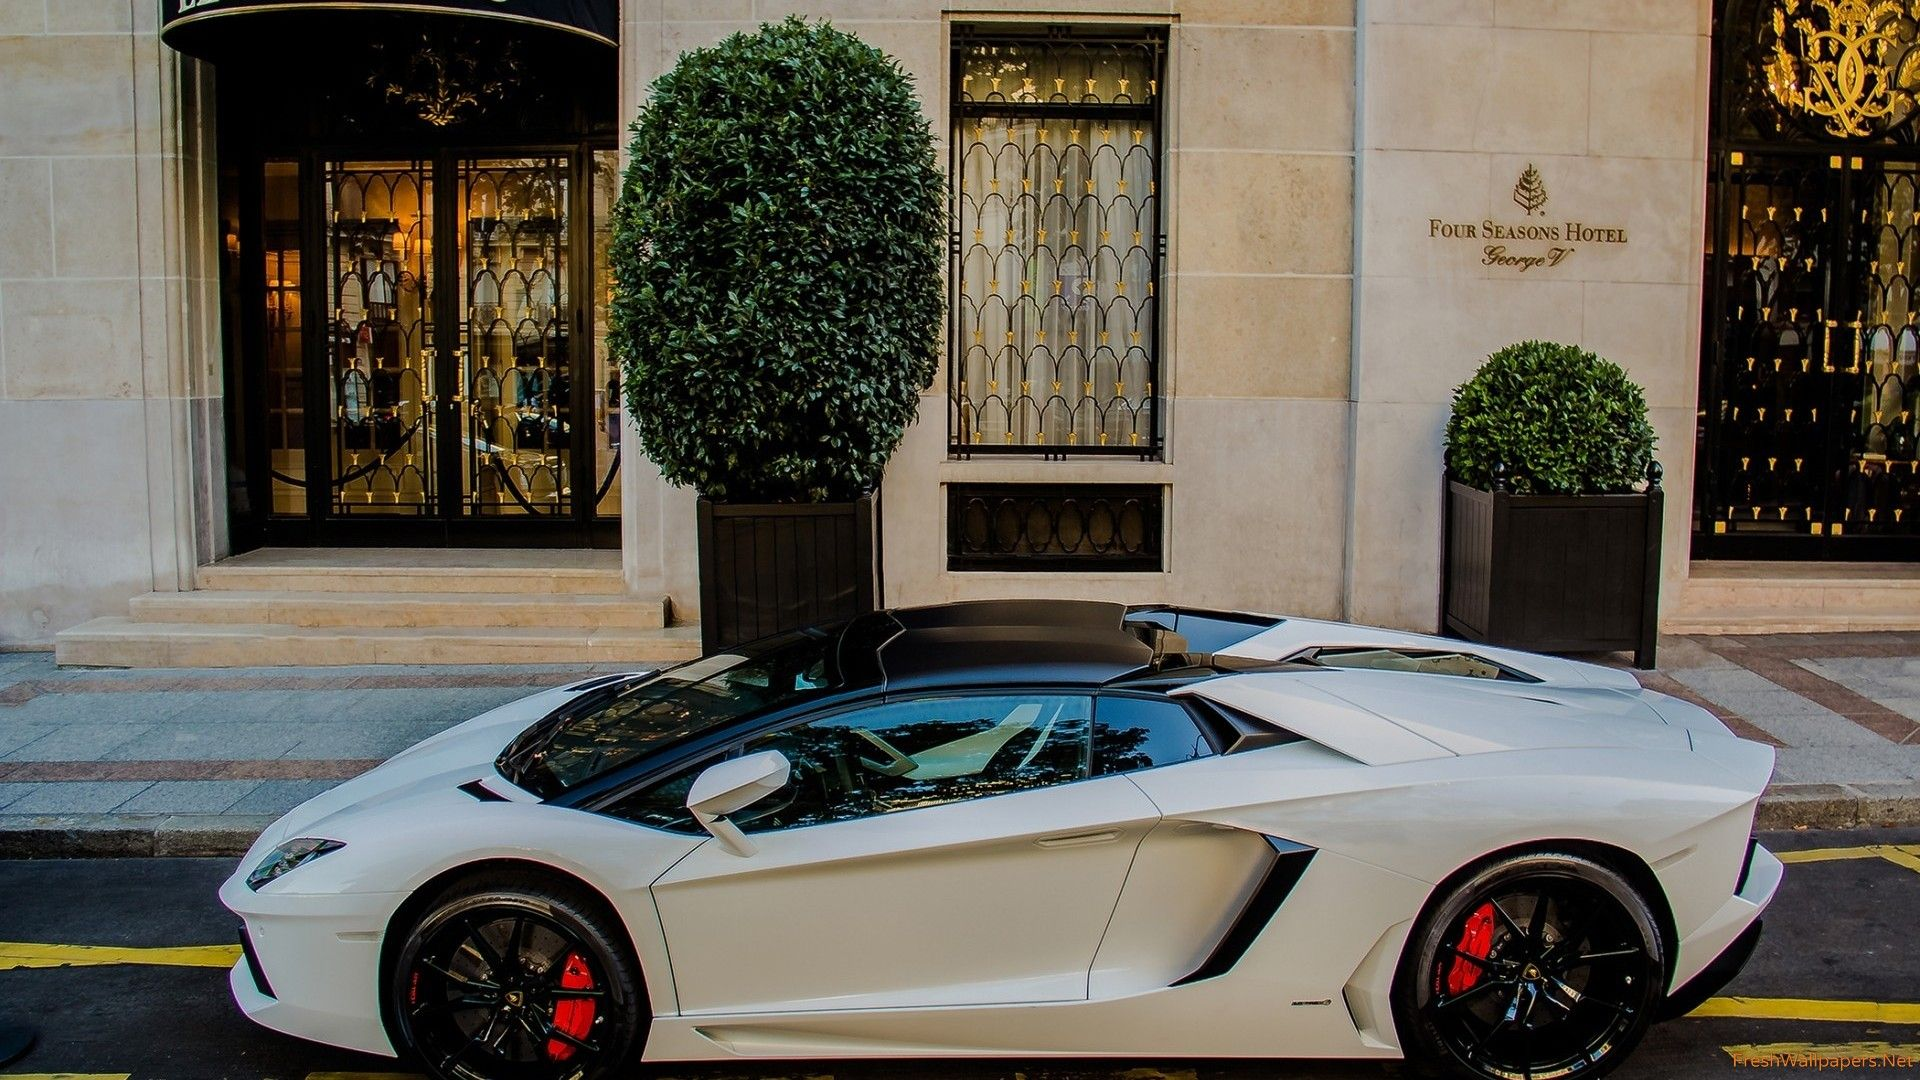 Lamborghini Aventador Roadster Wallpaper Hd 1920x1080